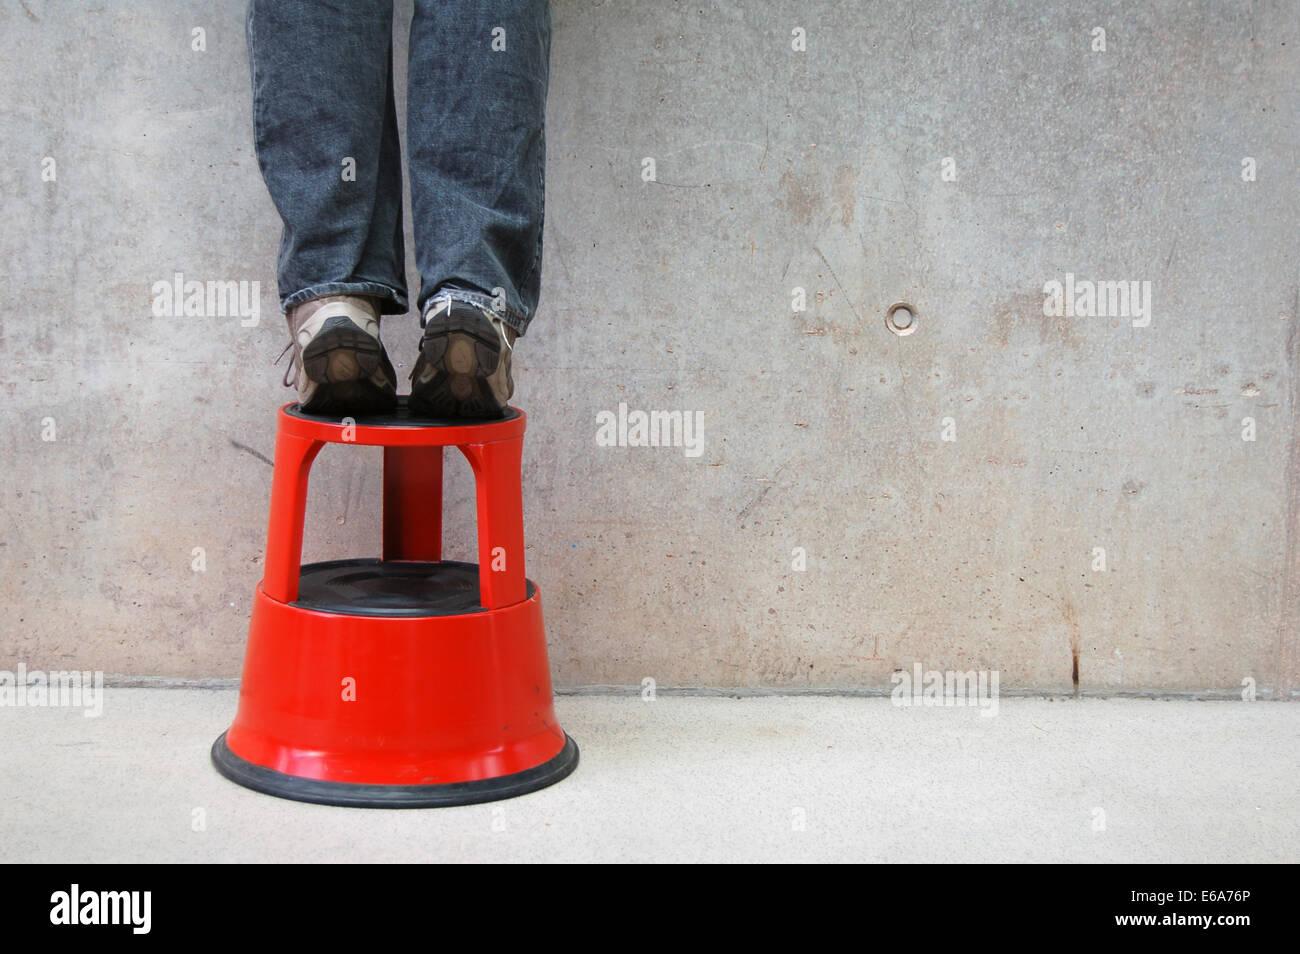 curiosity,stool - Stock Image